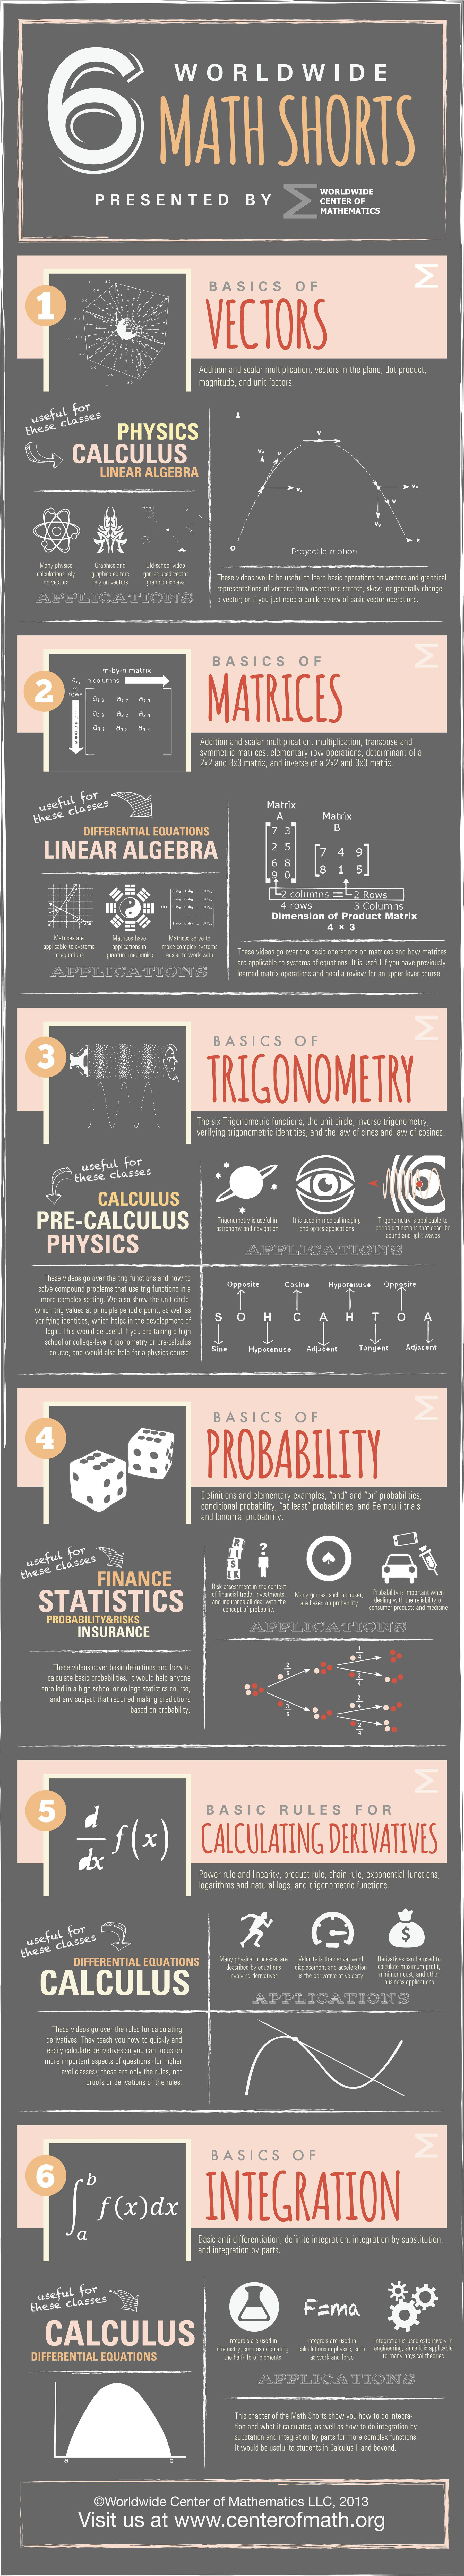 I am bad at maths, but I wanna become ...?